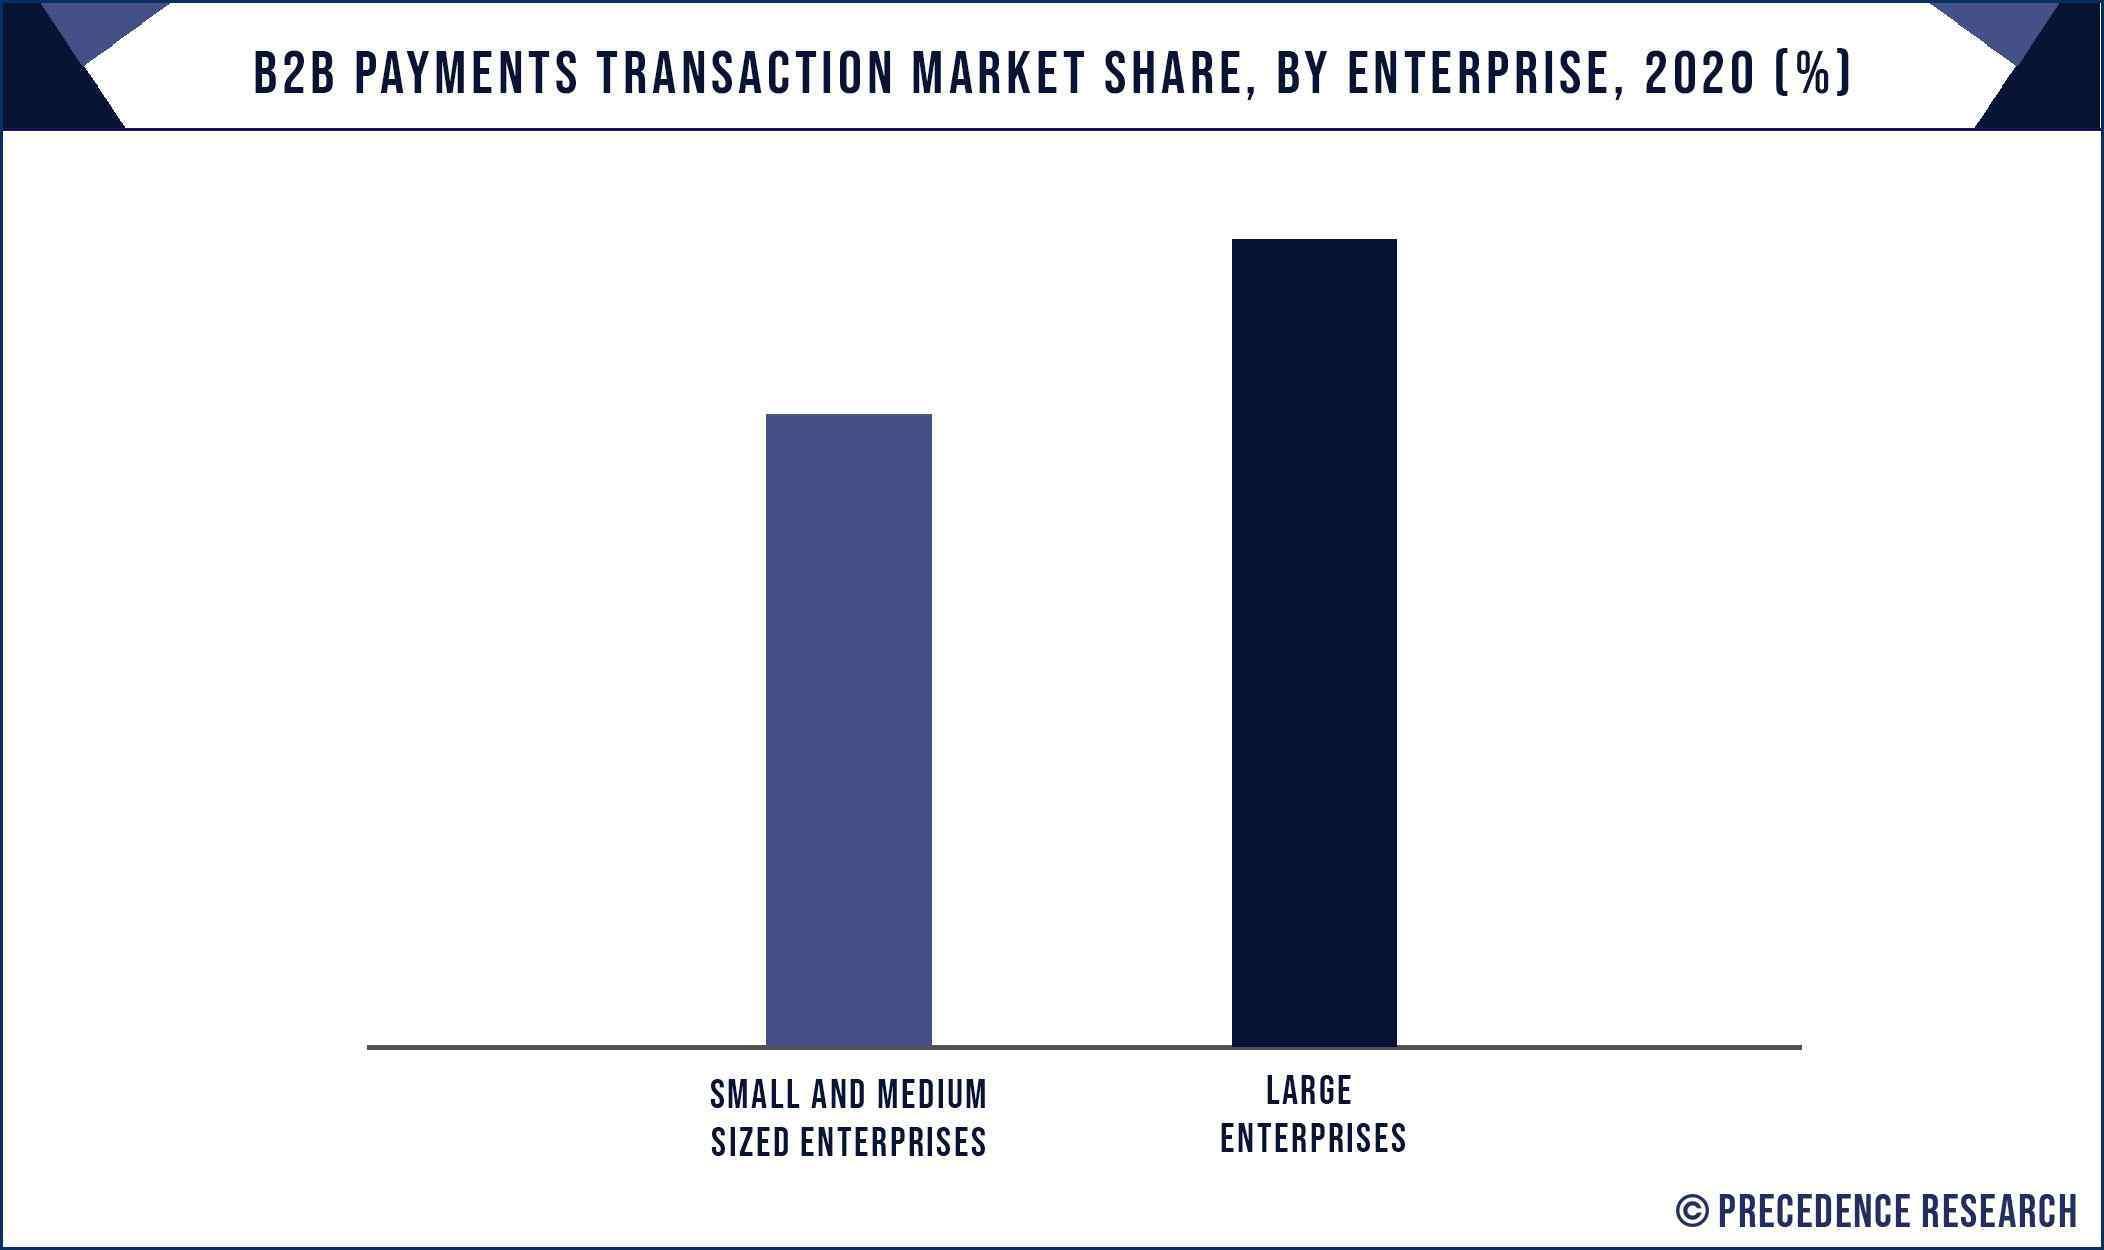 B2B Payments Transaction Market Share, By Enterprise, 2020 (%)